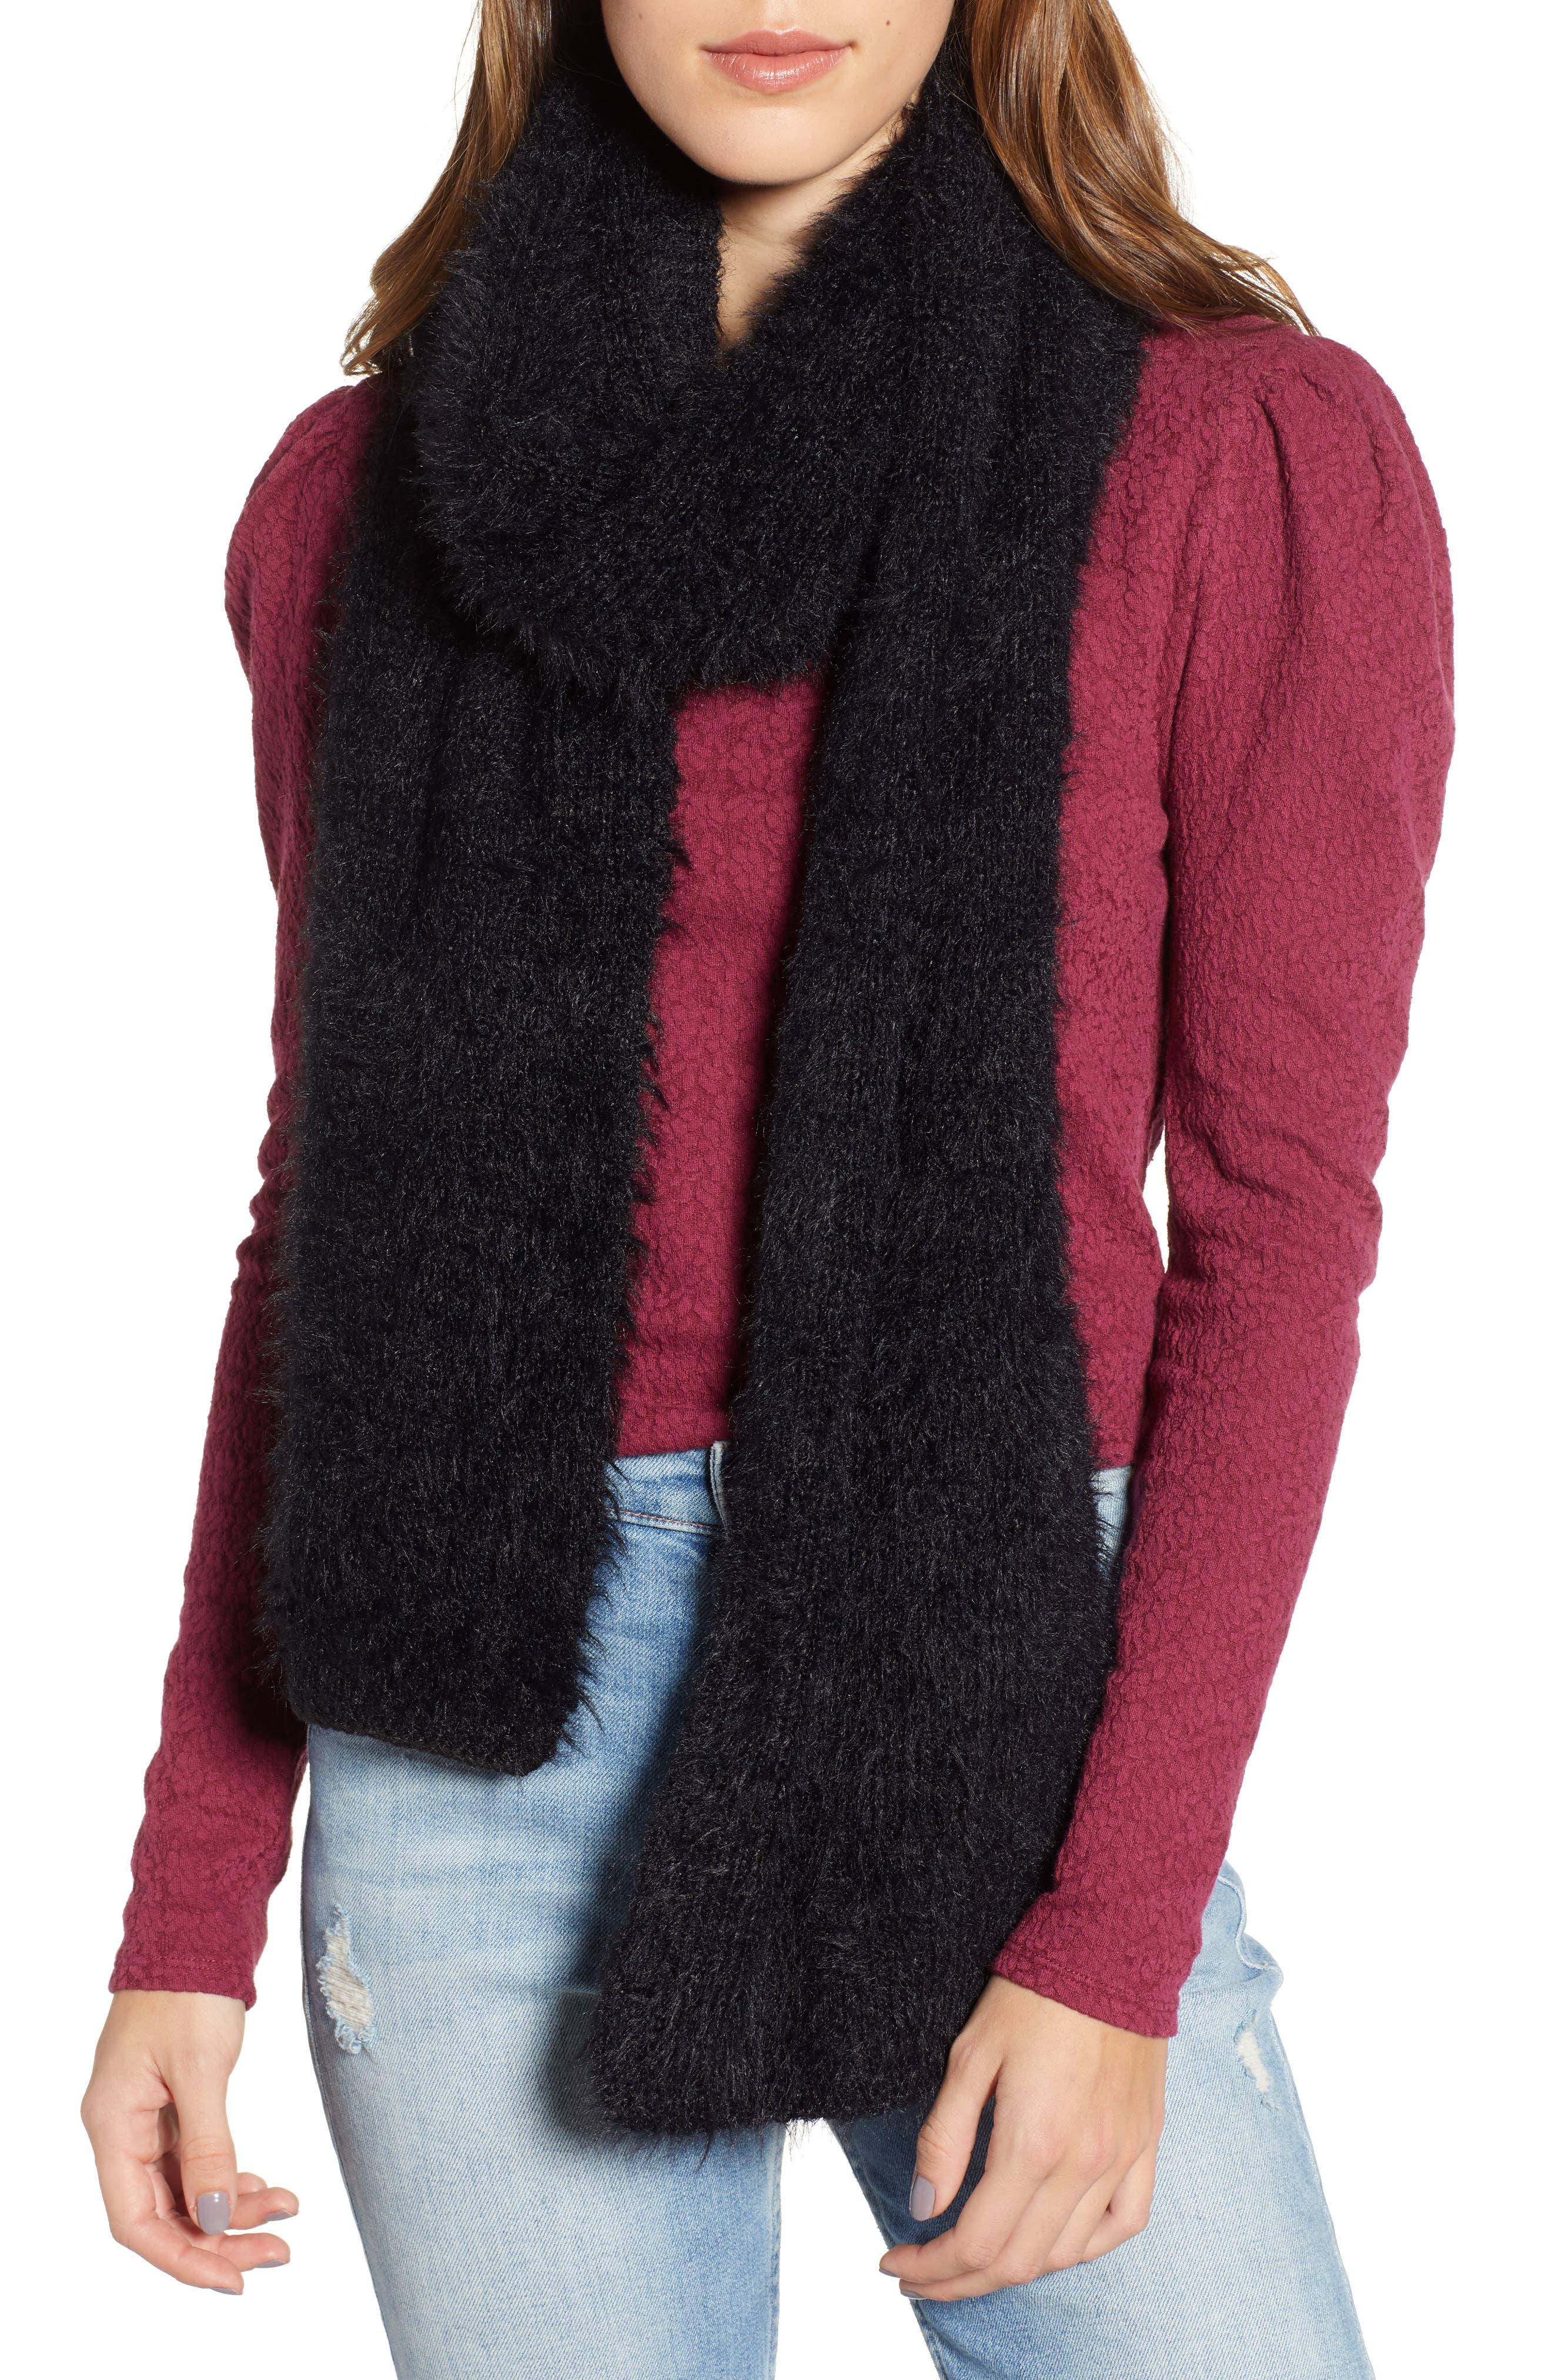 Eyleash Knit Muffler,                             Main thumbnail 1, color,                             BLACK